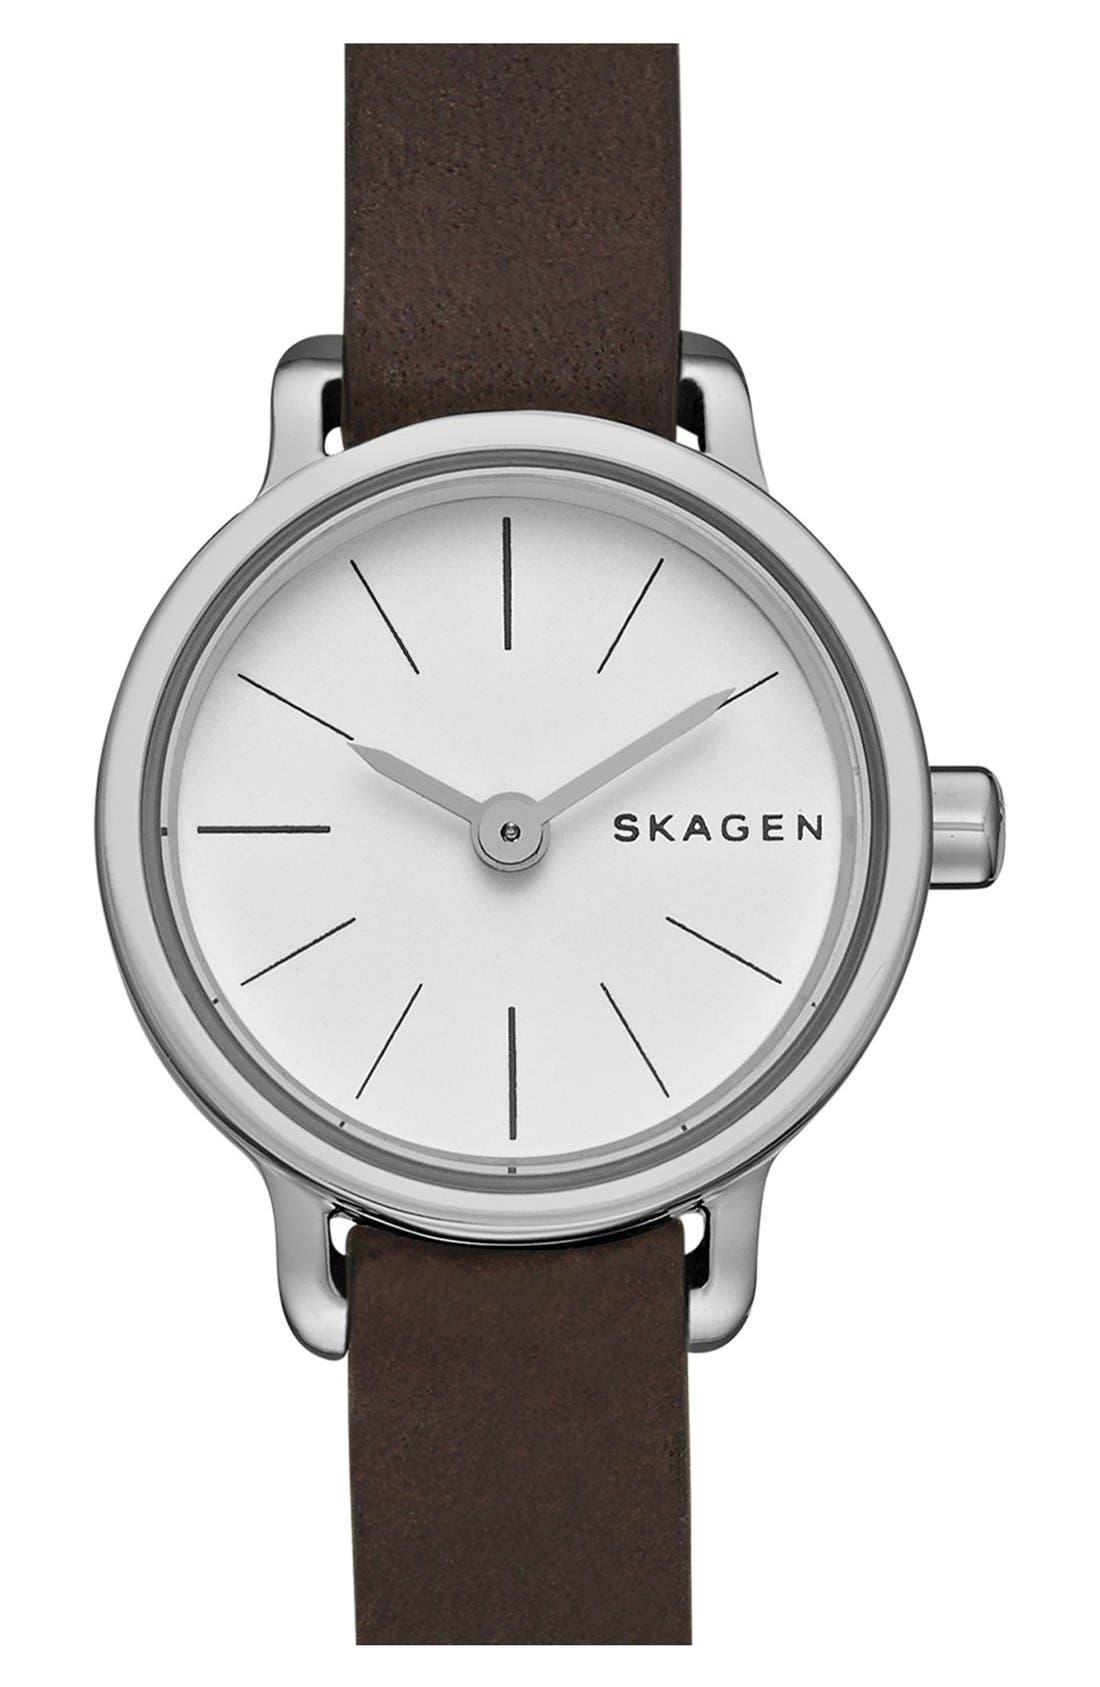 Main Image - Skagen 'Hagen' Leather Strap Watch, 20mm